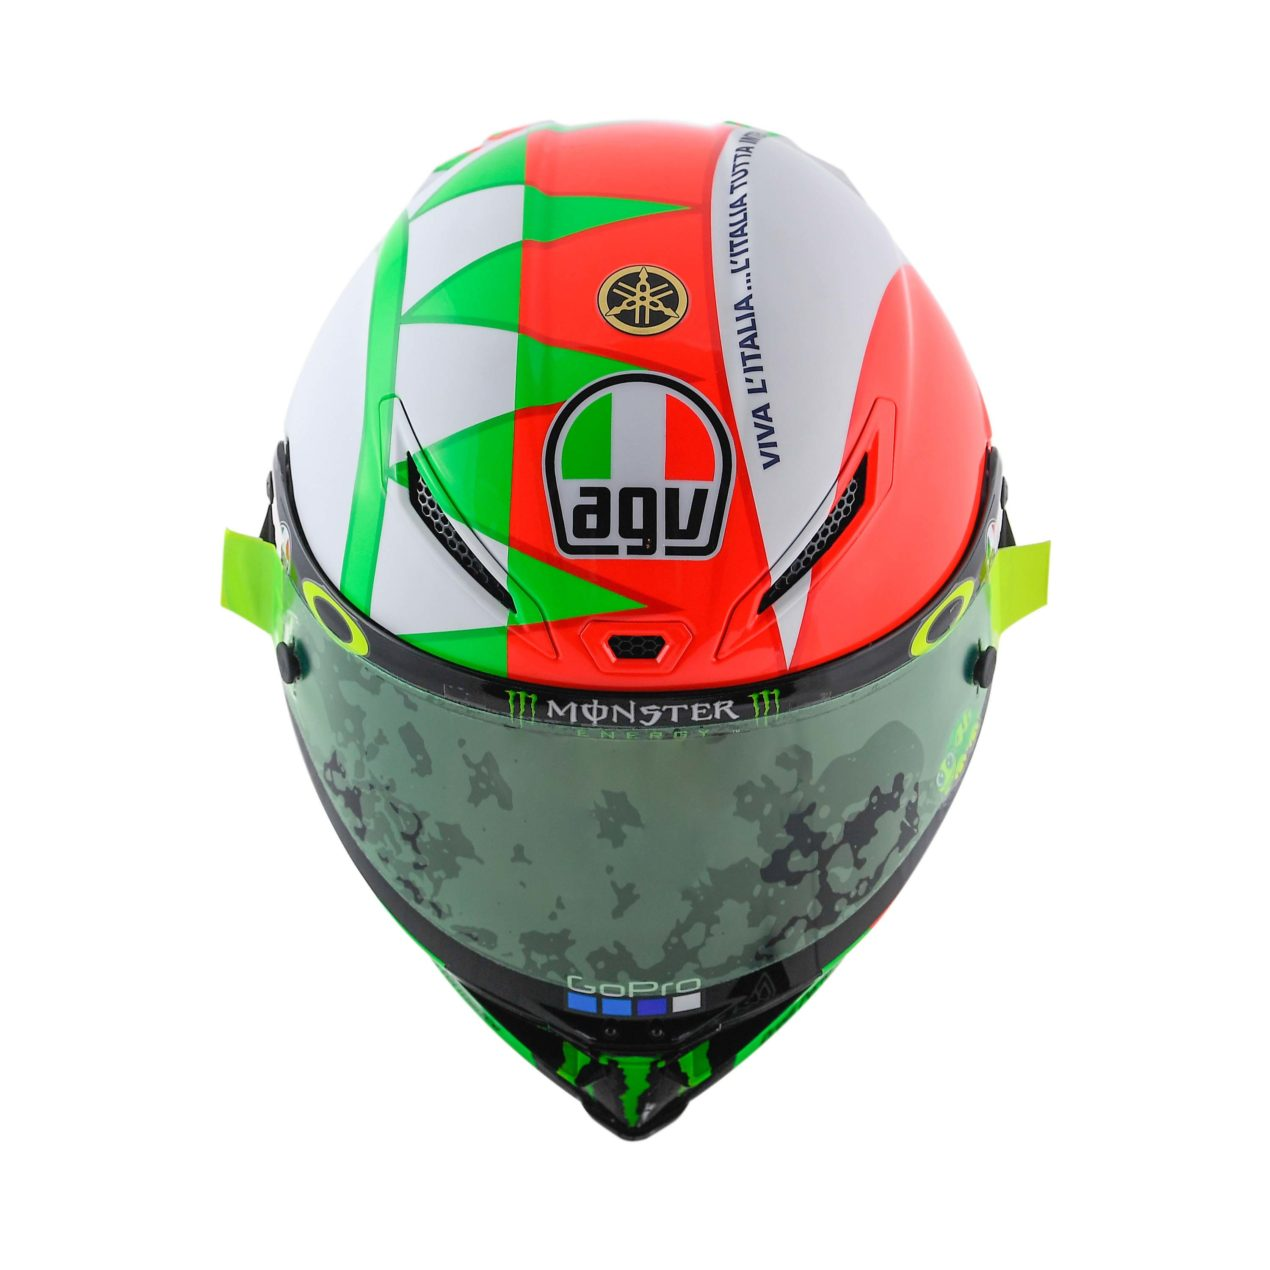 Valentino rossi 2018 helmet